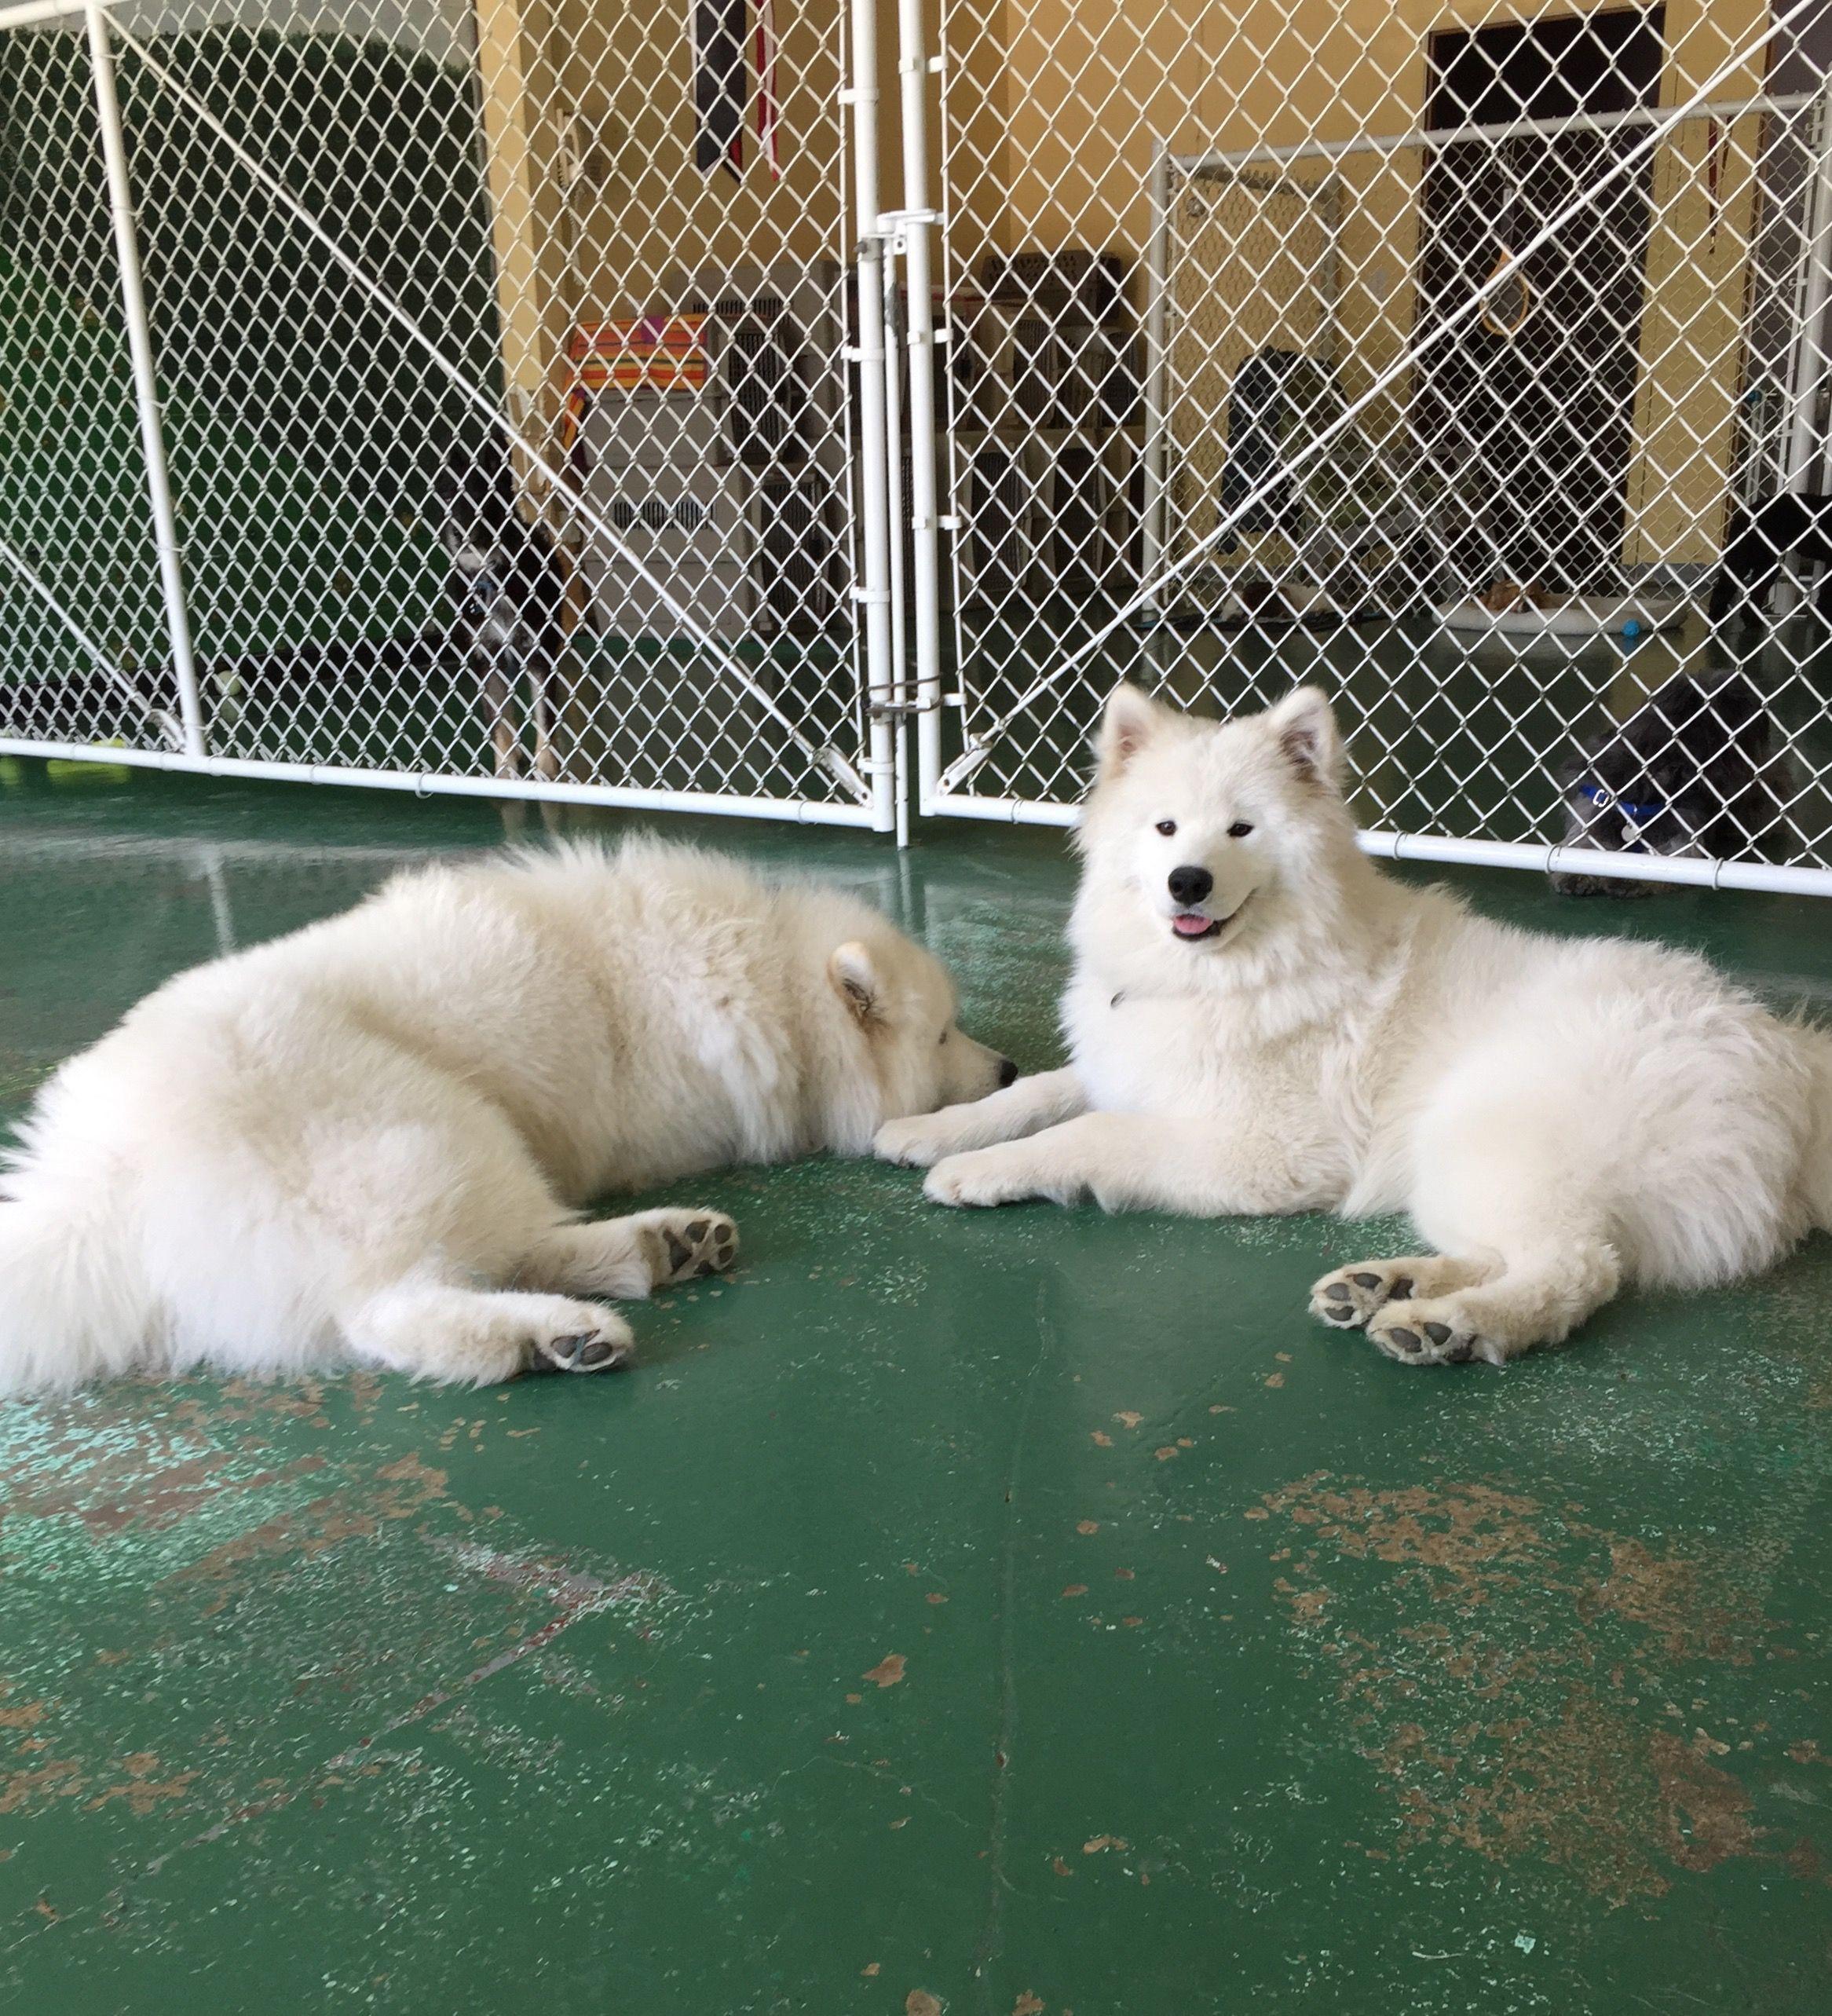 Loki & Barley, our Profile Doggies of the Week ◆ www.arfnbark.com & www.facebook.com/arfnbarkpdx